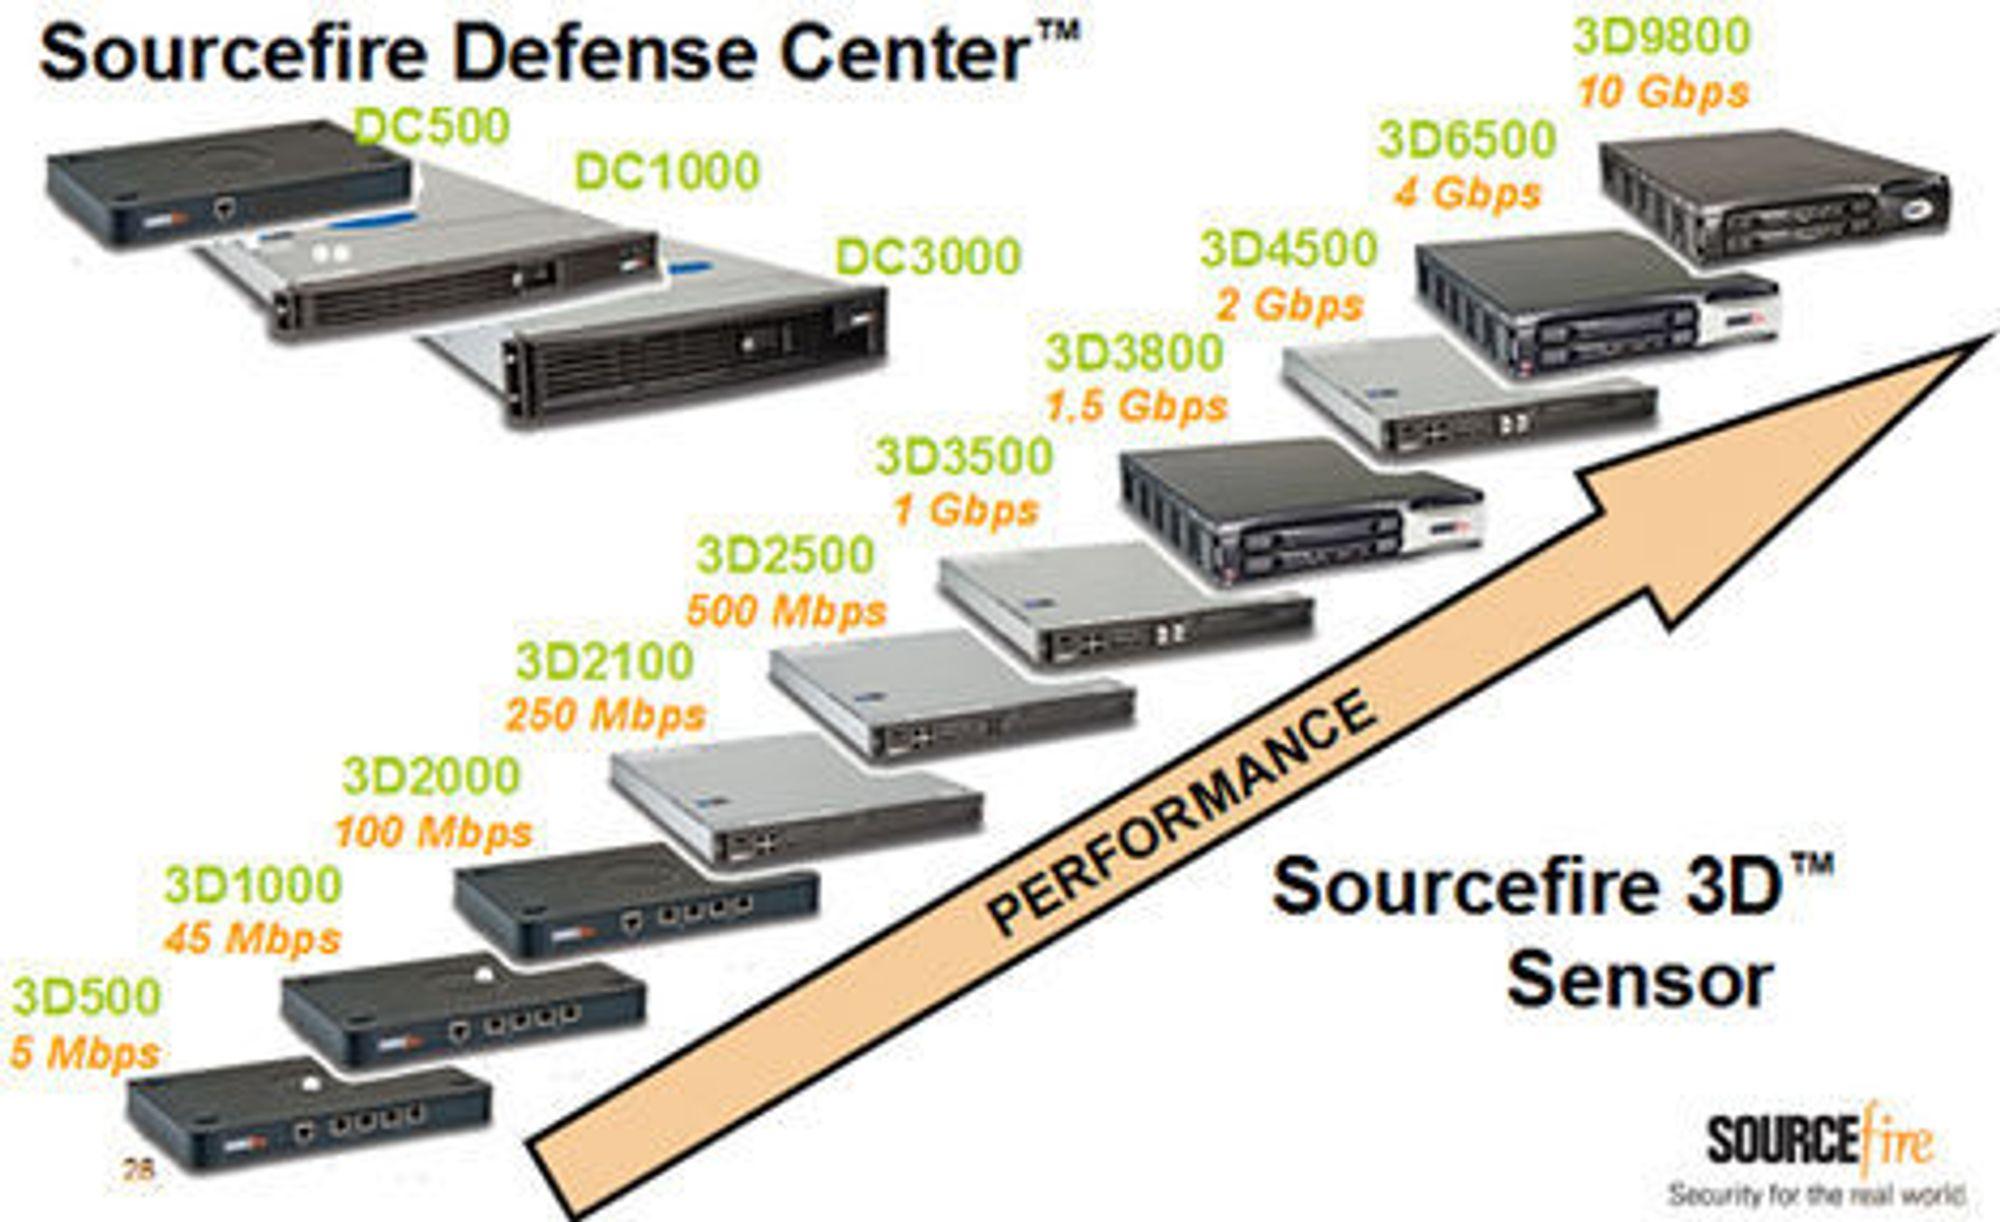 Sourcefire har to typer maskinvare i sitt 3D System.